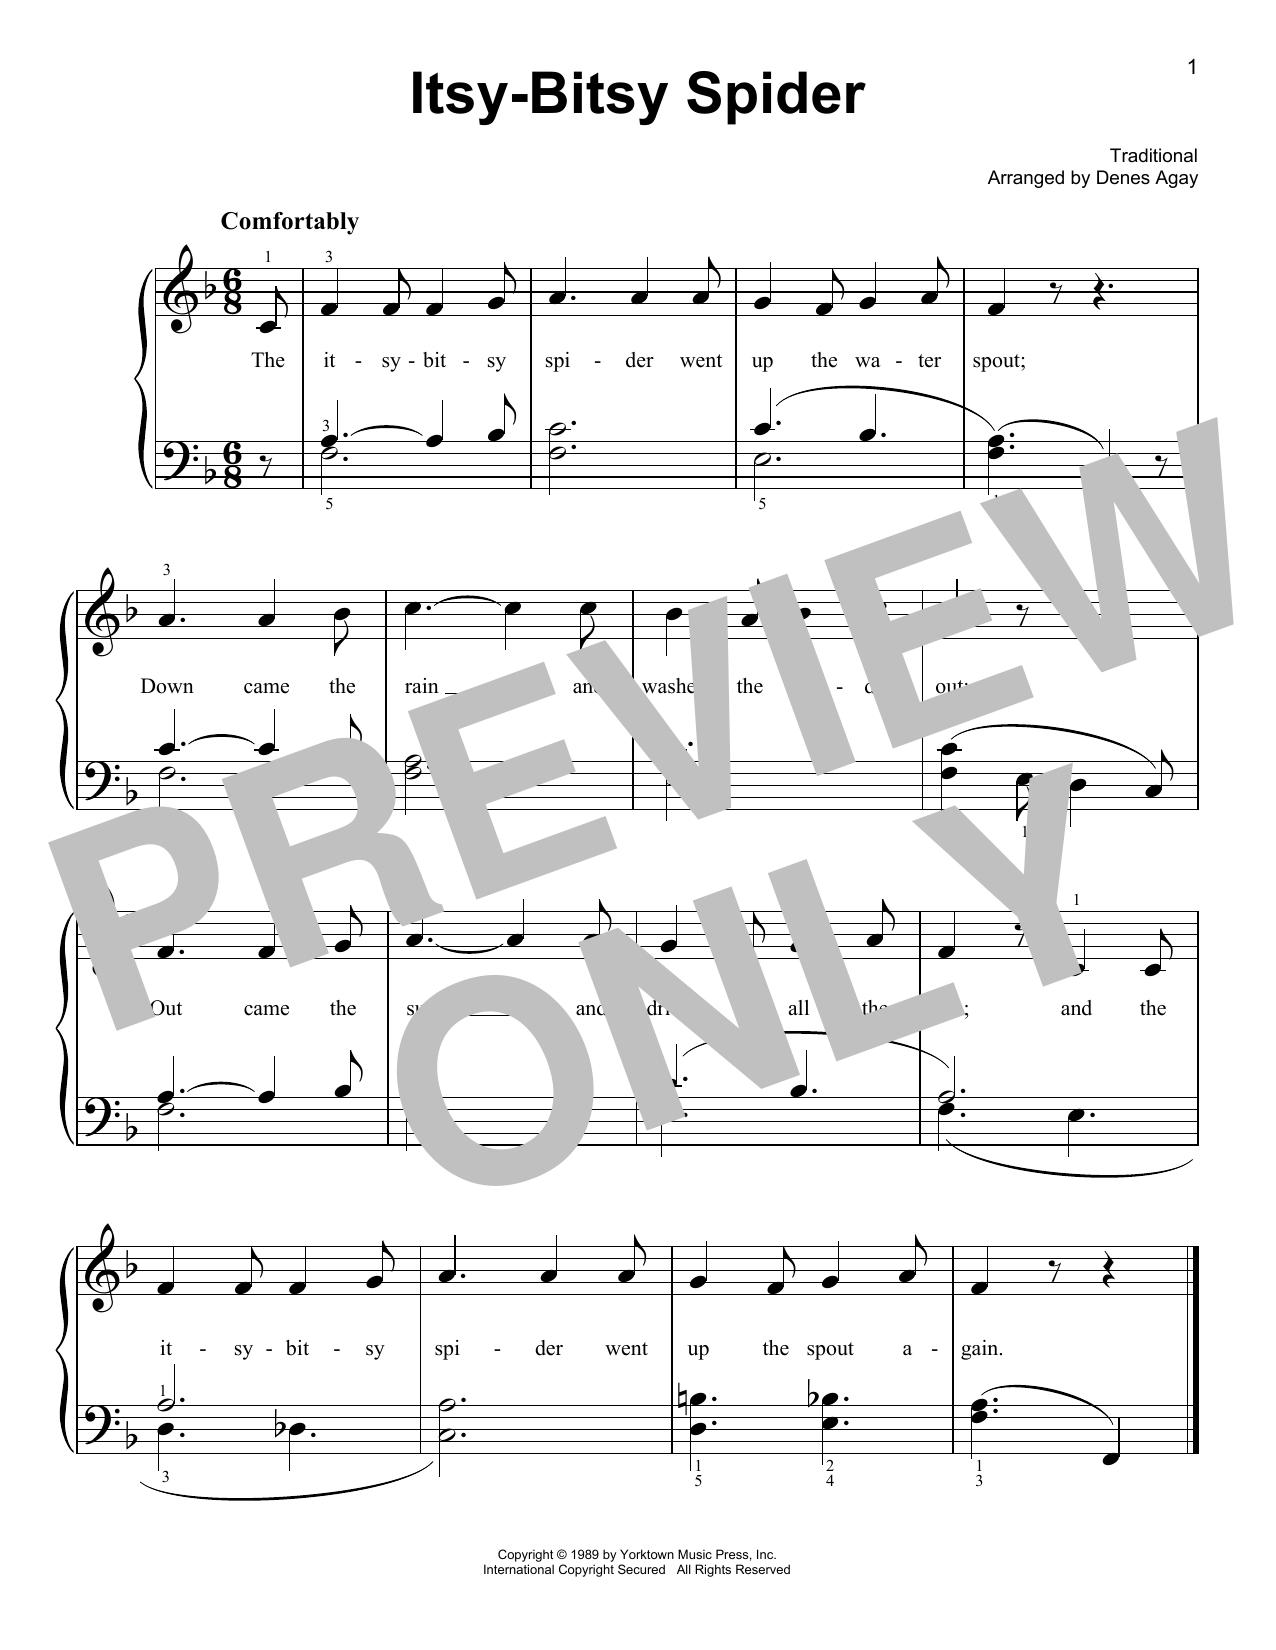 Itsy Bitsy Spider (arr. Denes Agay) (Easy Piano)